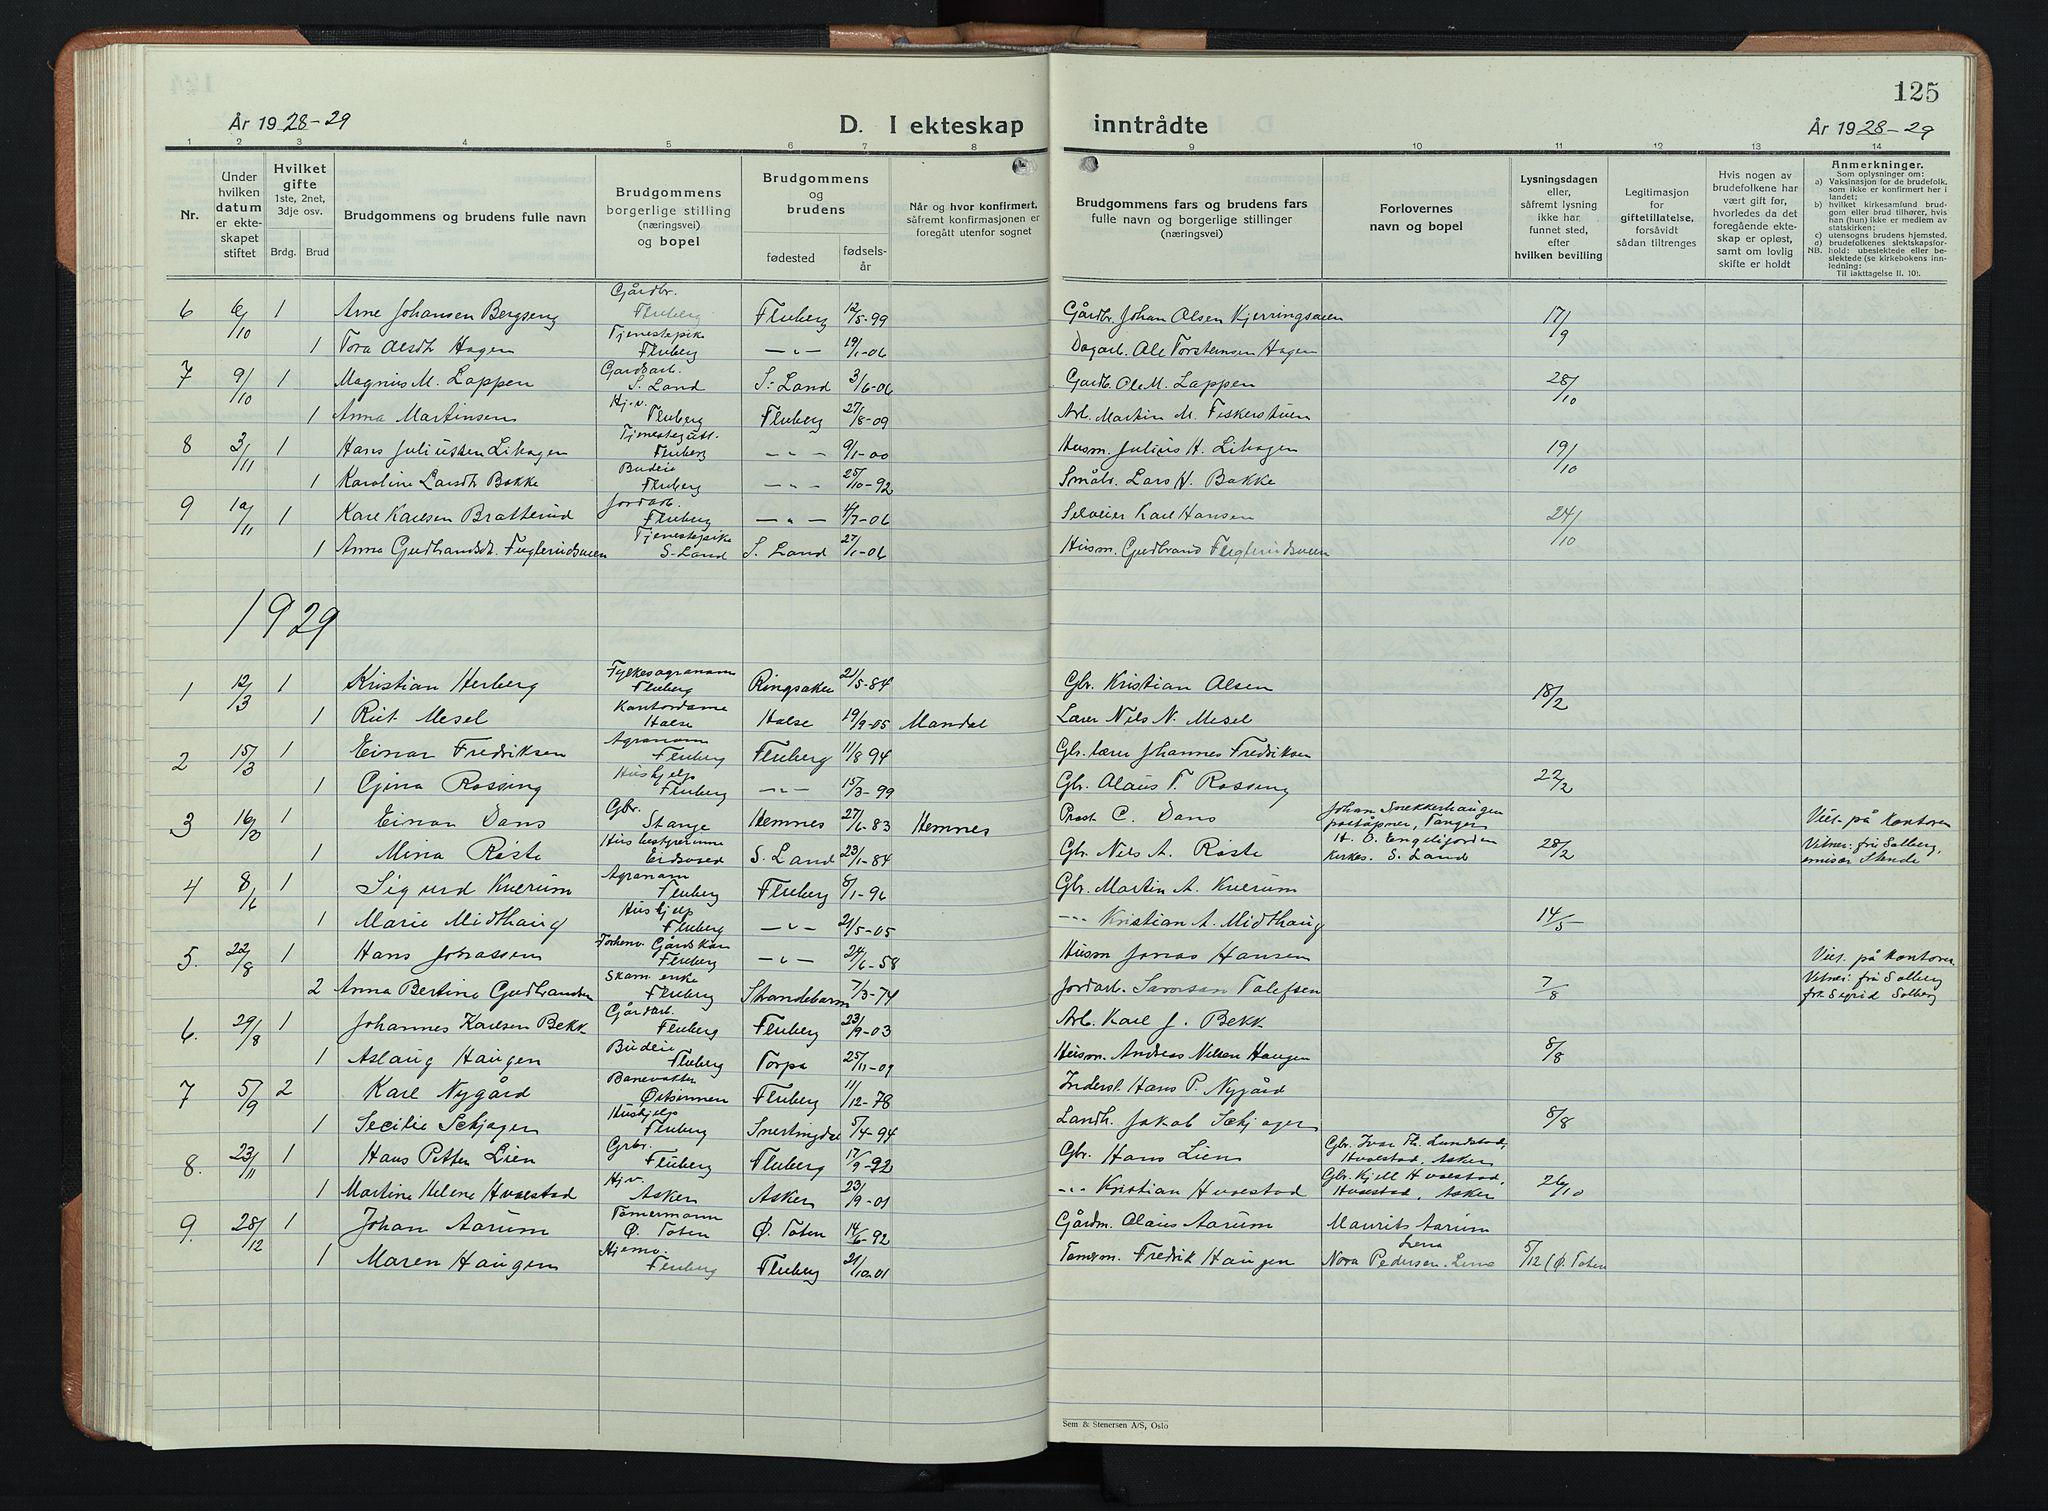 SAH, Søndre Land prestekontor, L/L0008: Klokkerbok nr. 8, 1926-1950, s. 125